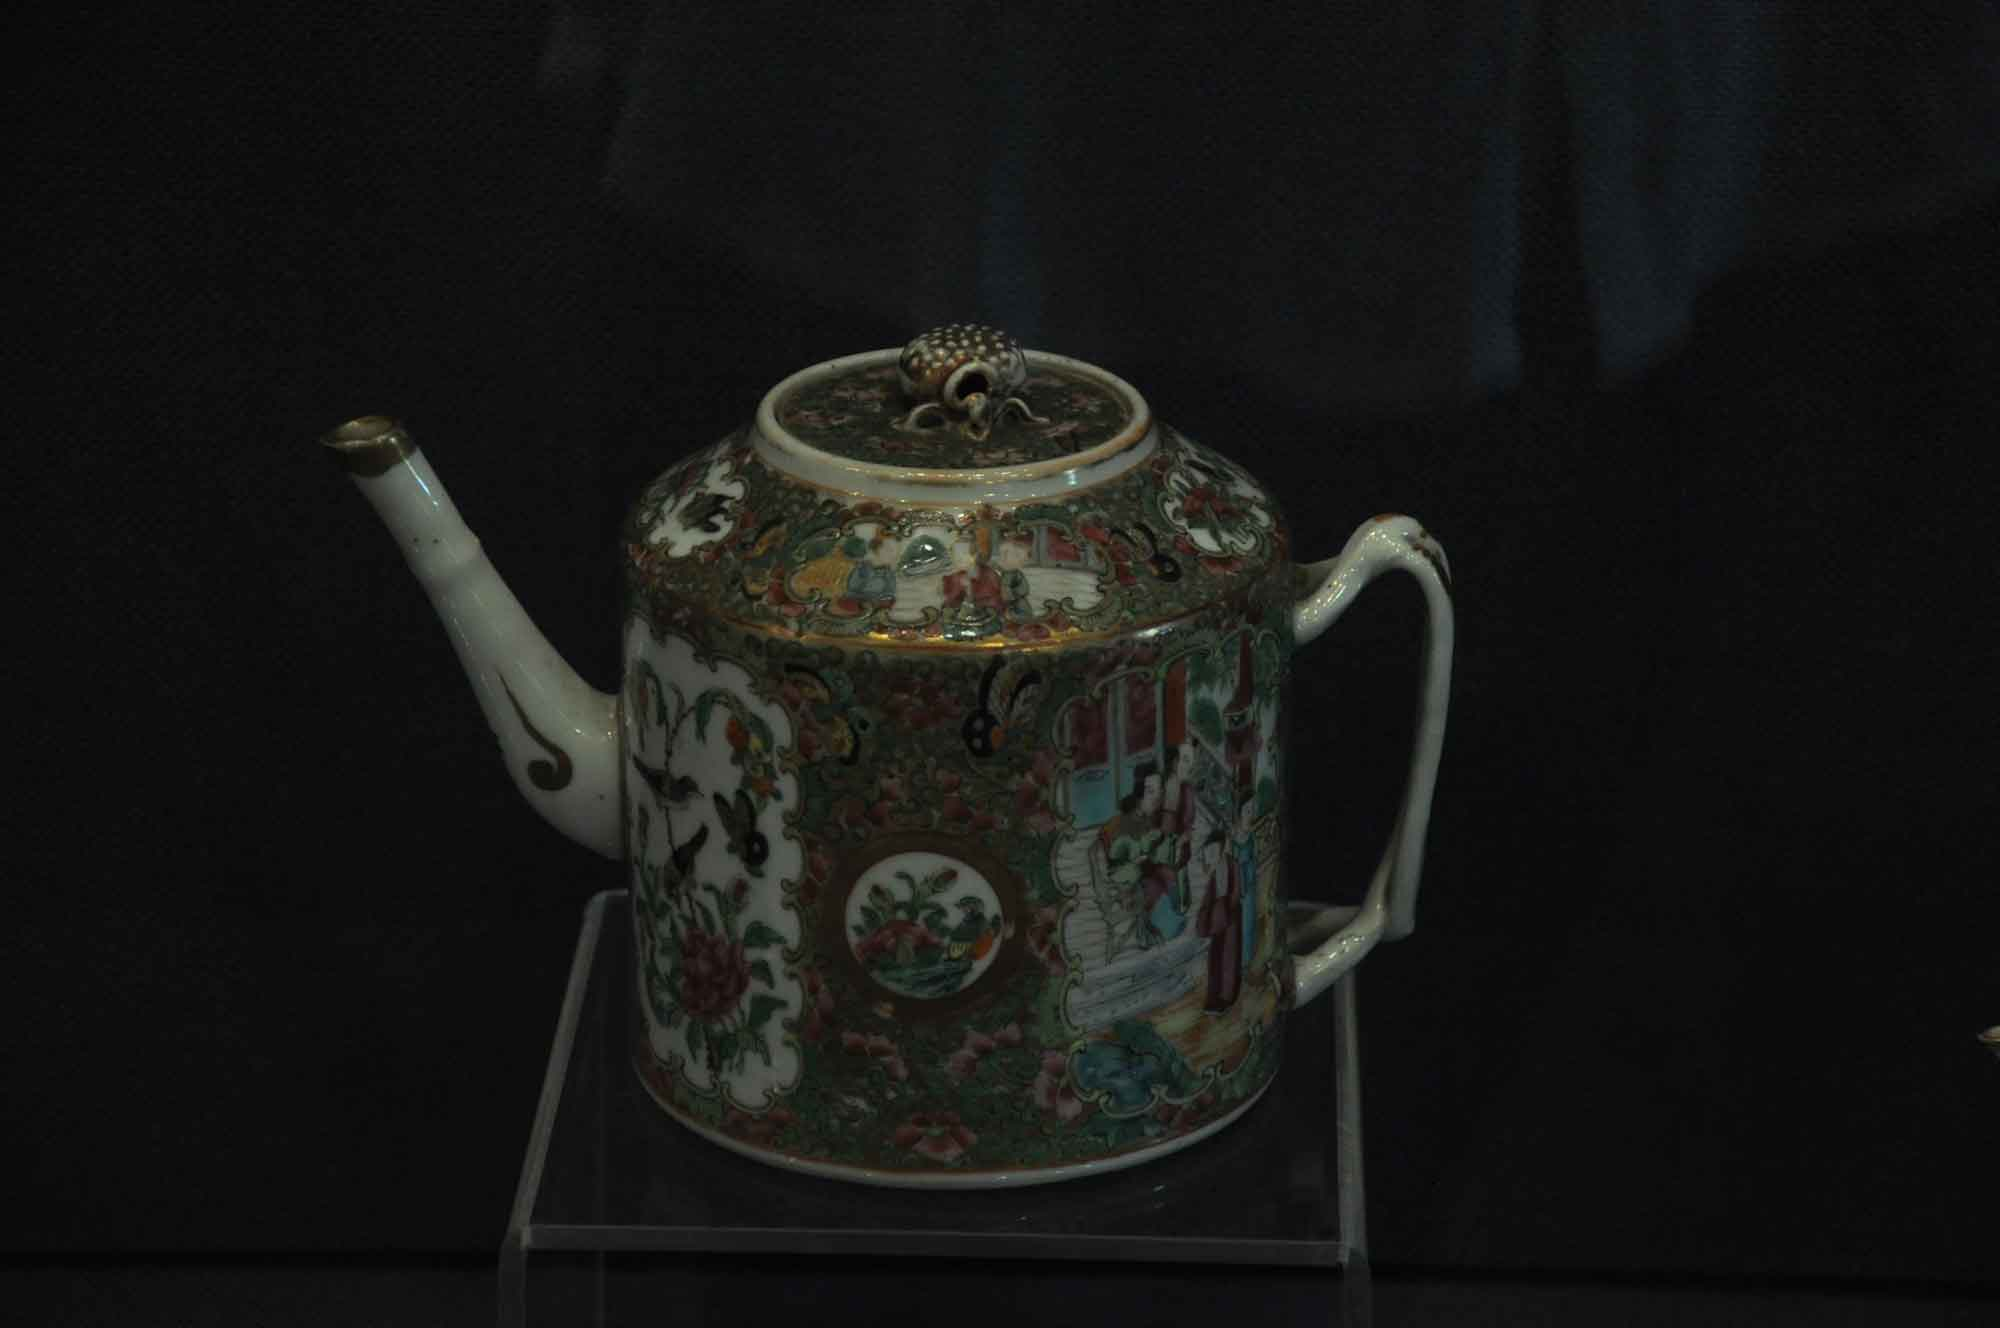 Macau Tea and Culture House teapot